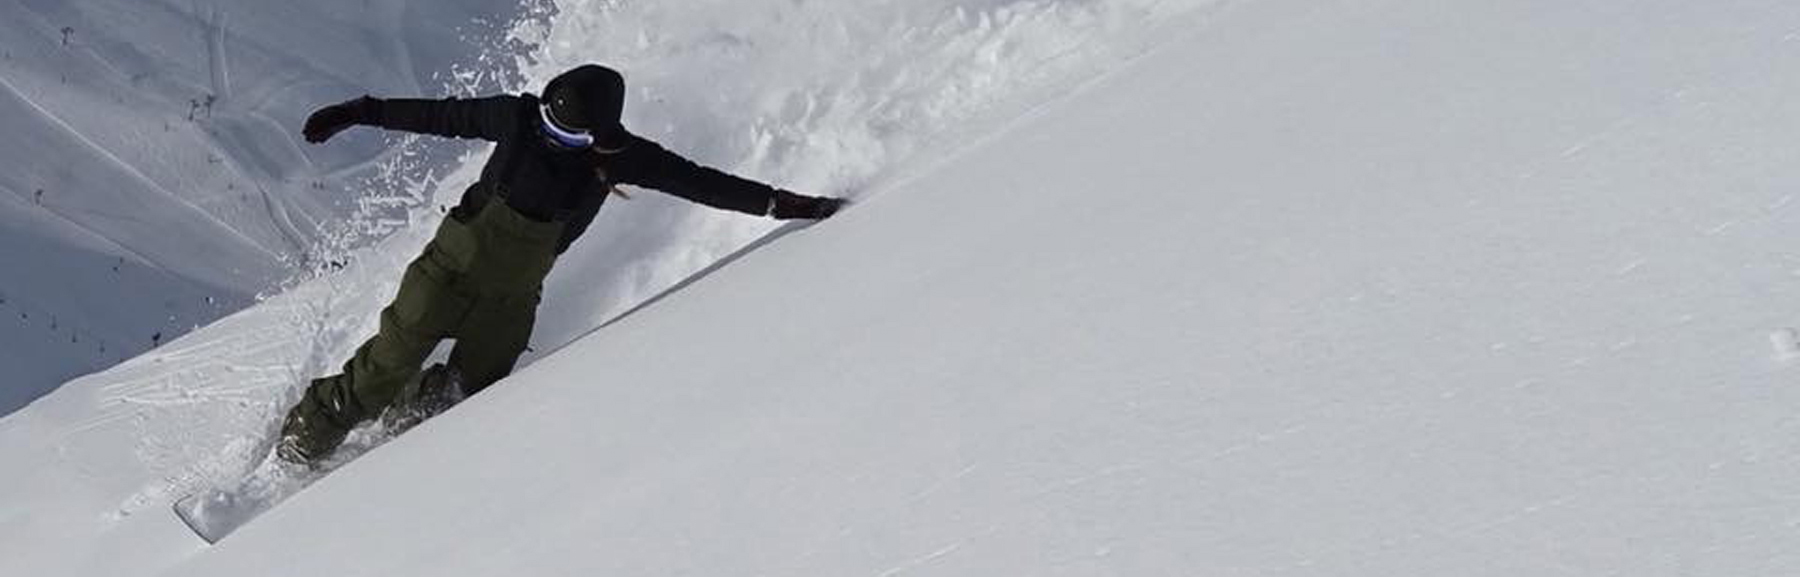 safe_formacion-tecnico_deportivo_nivel_1-snowboard-les_deux_alpes-verano2018-slider